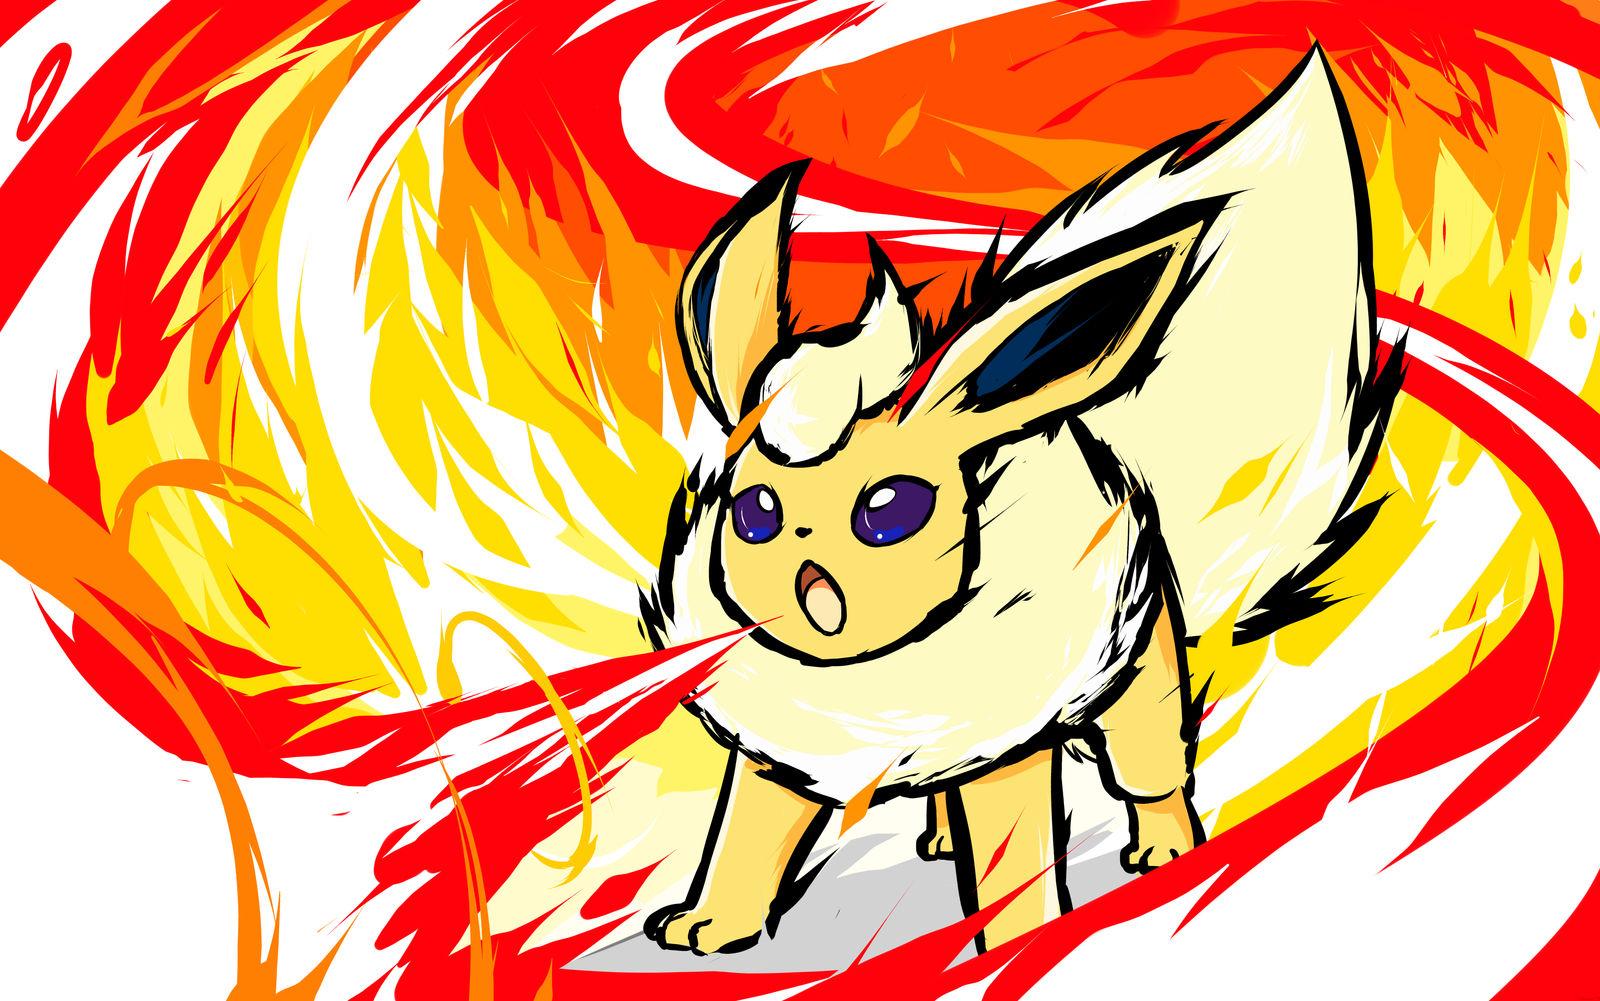 Shiny Flareon | Fire Spin